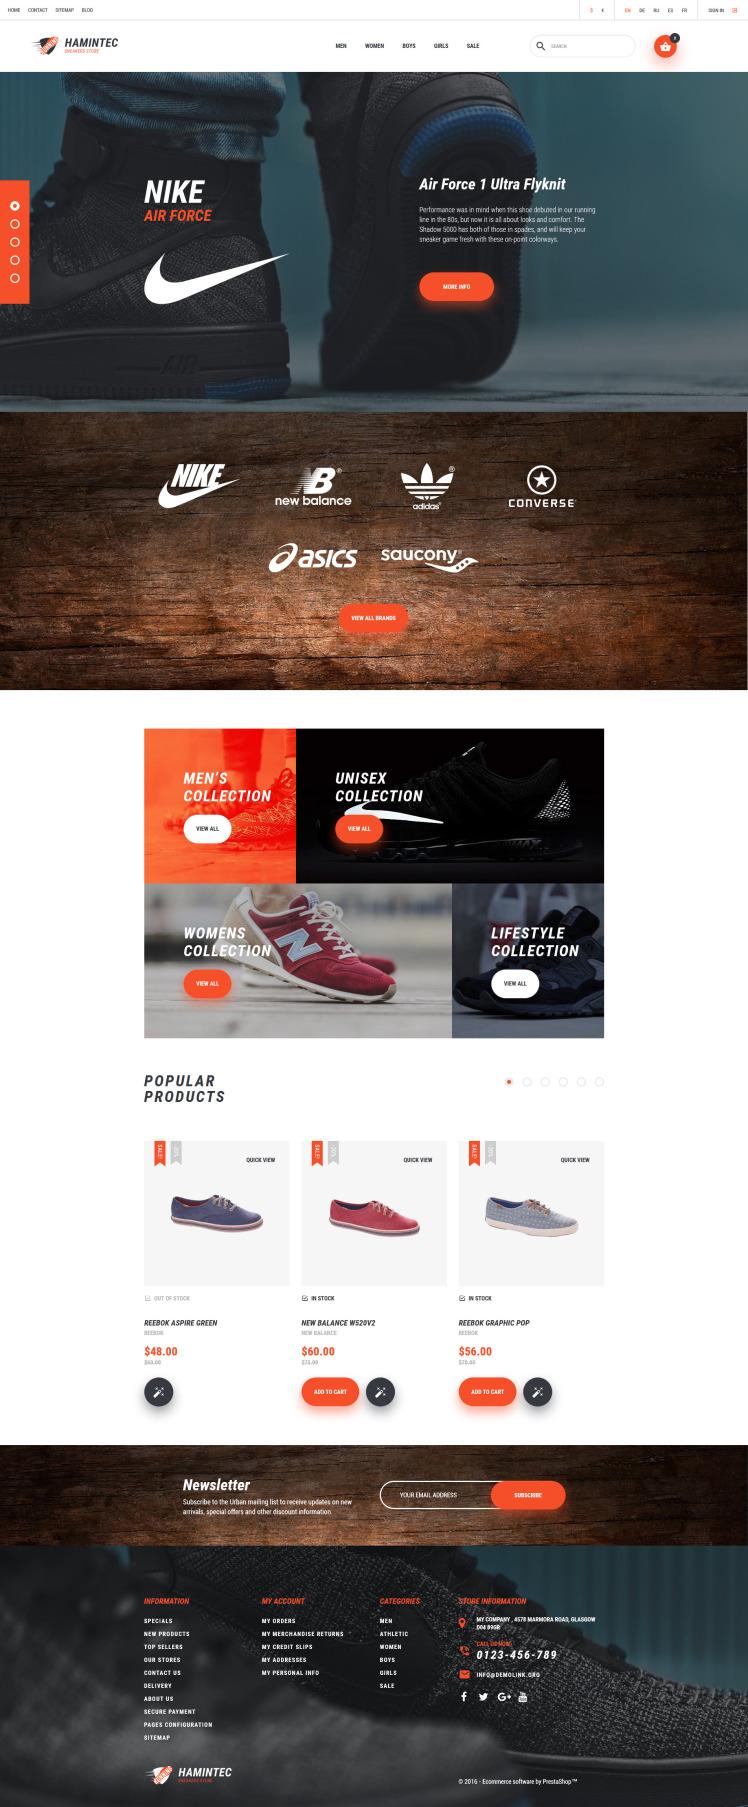 Hamintec Sneakers Store PrestaShop Themes